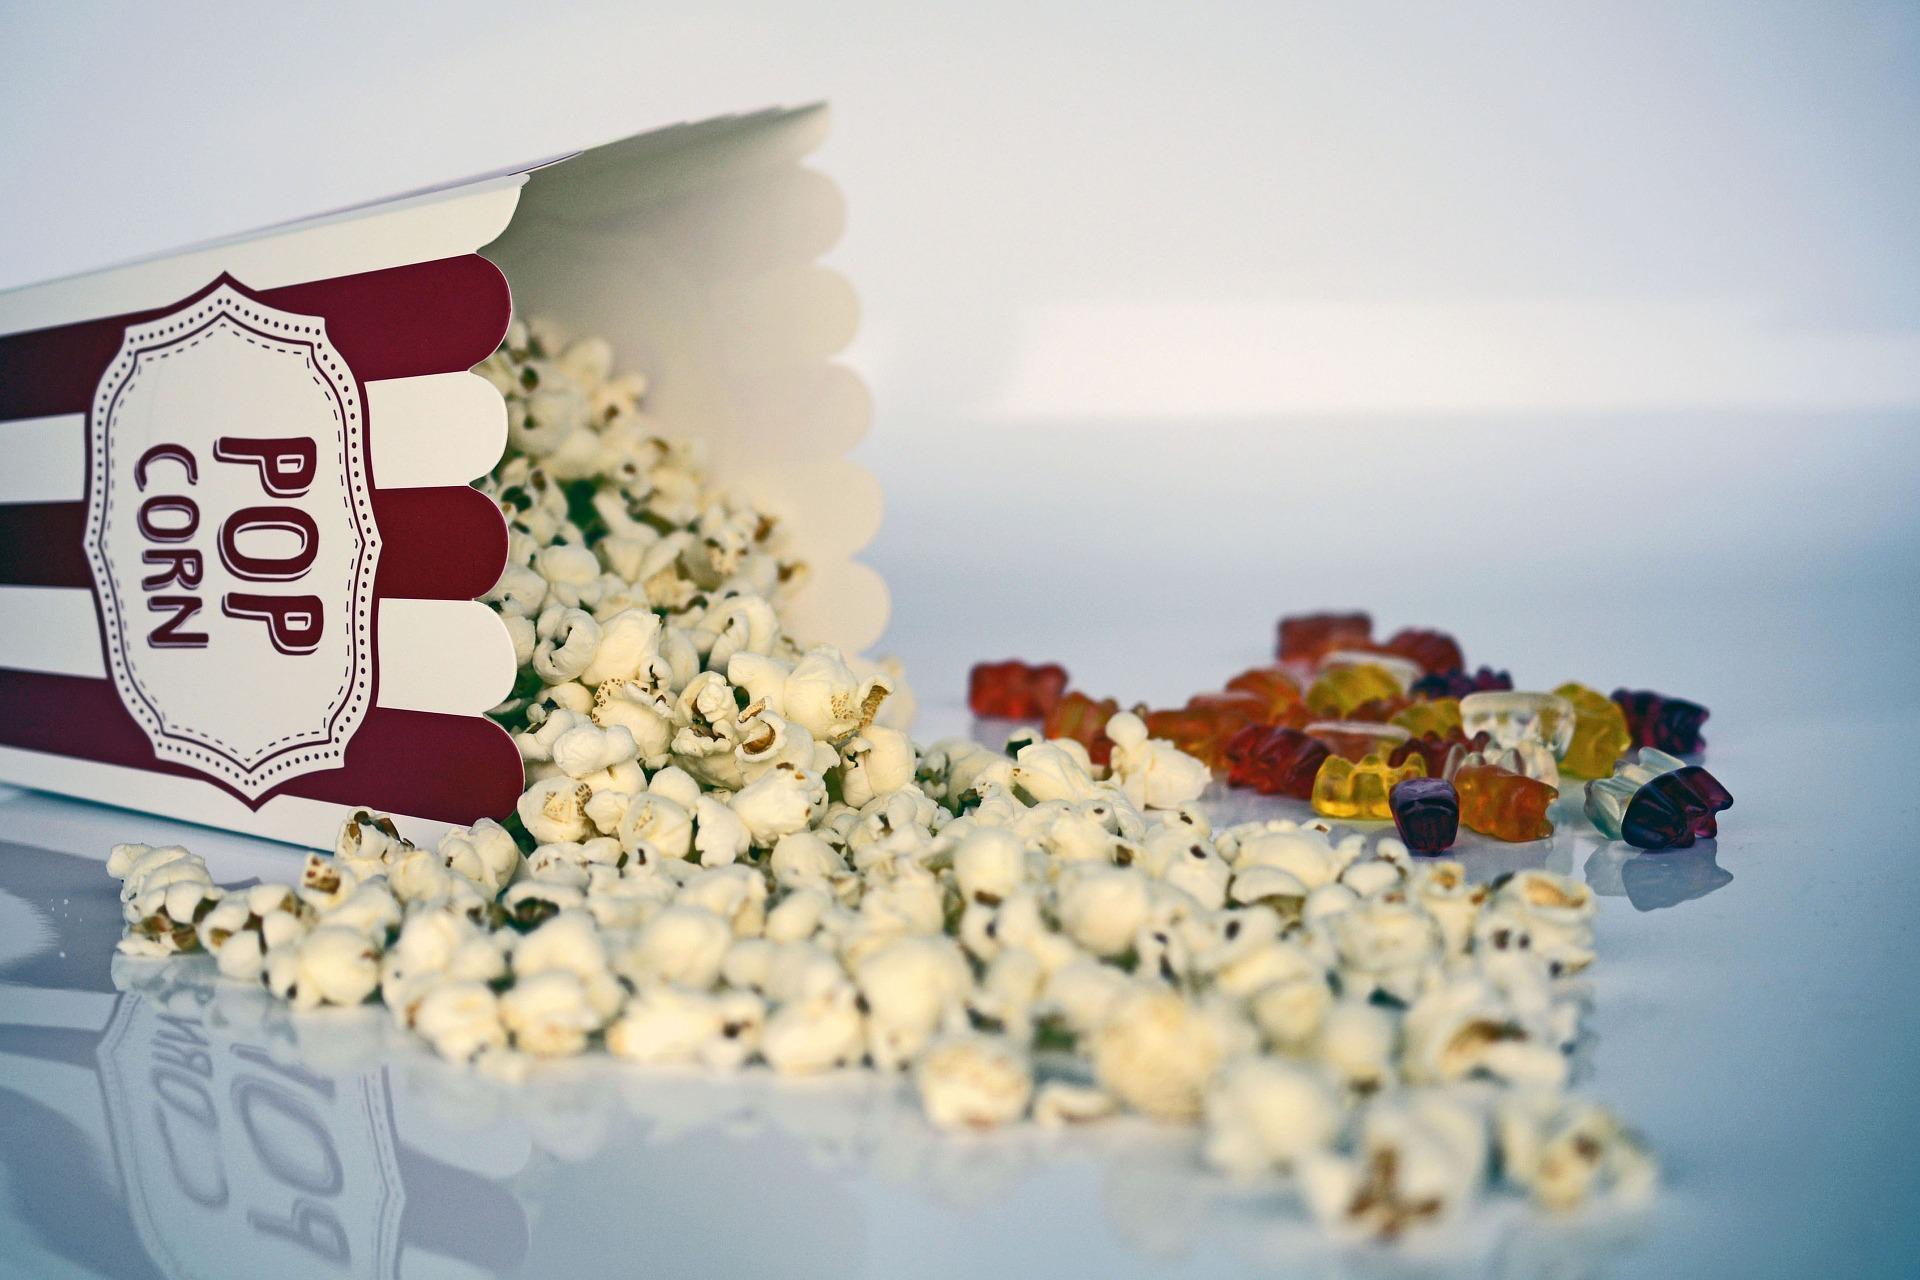 Popcorn box and gummy bears